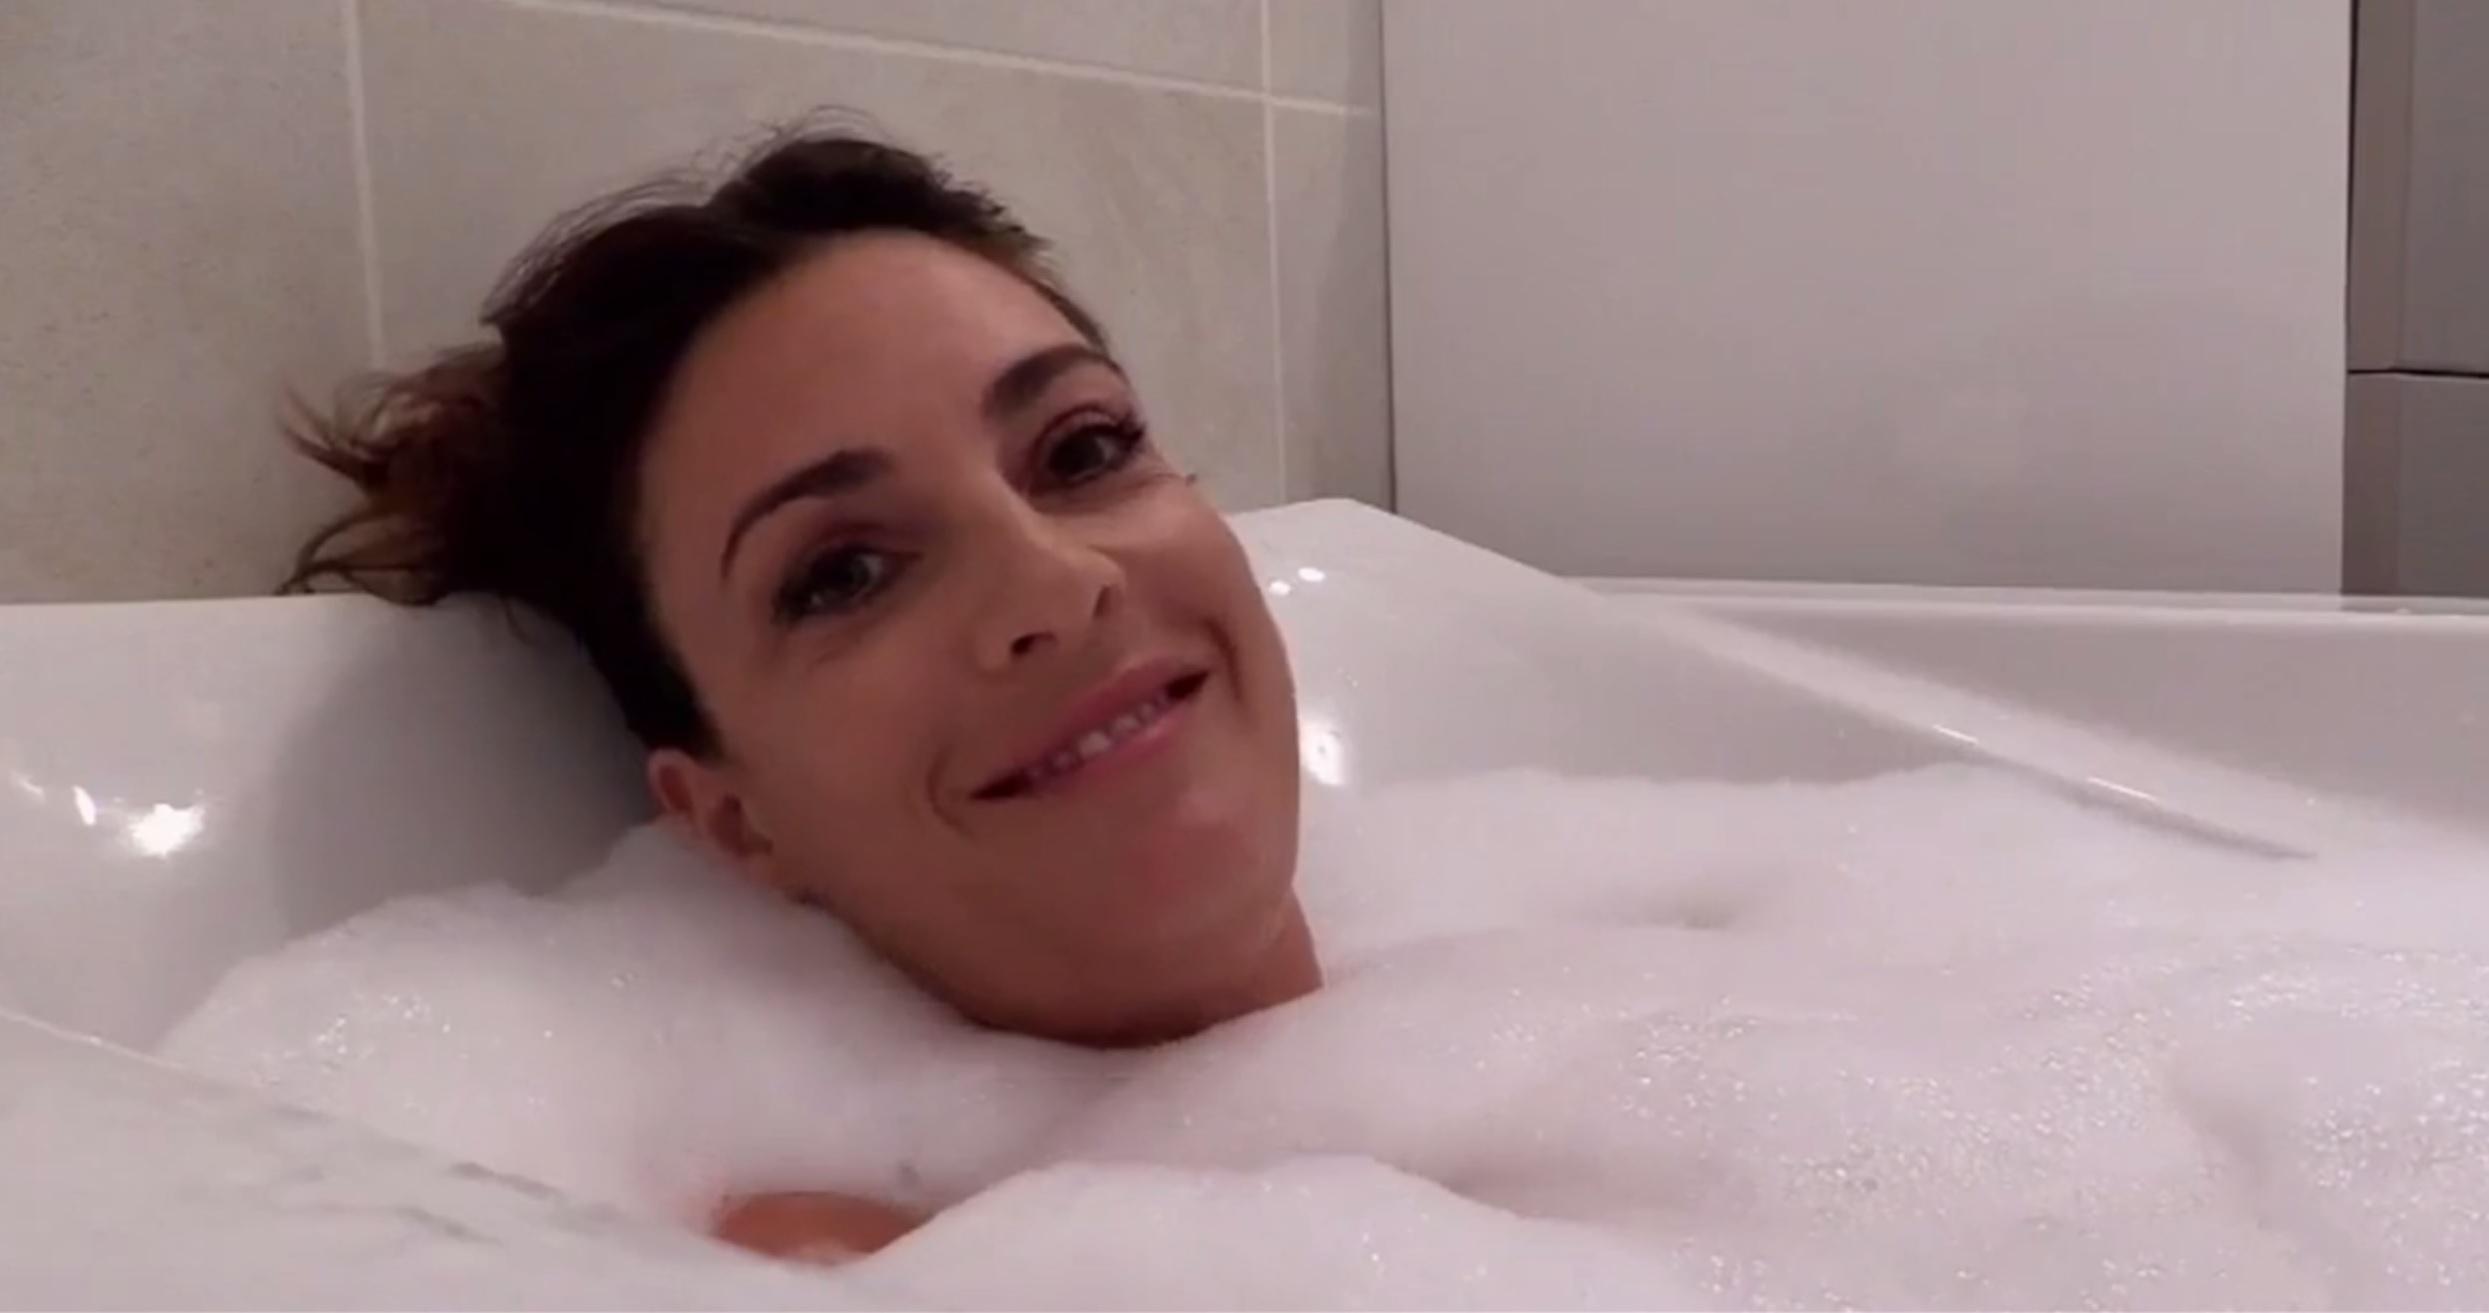 Eve Angeli nue dans son bain